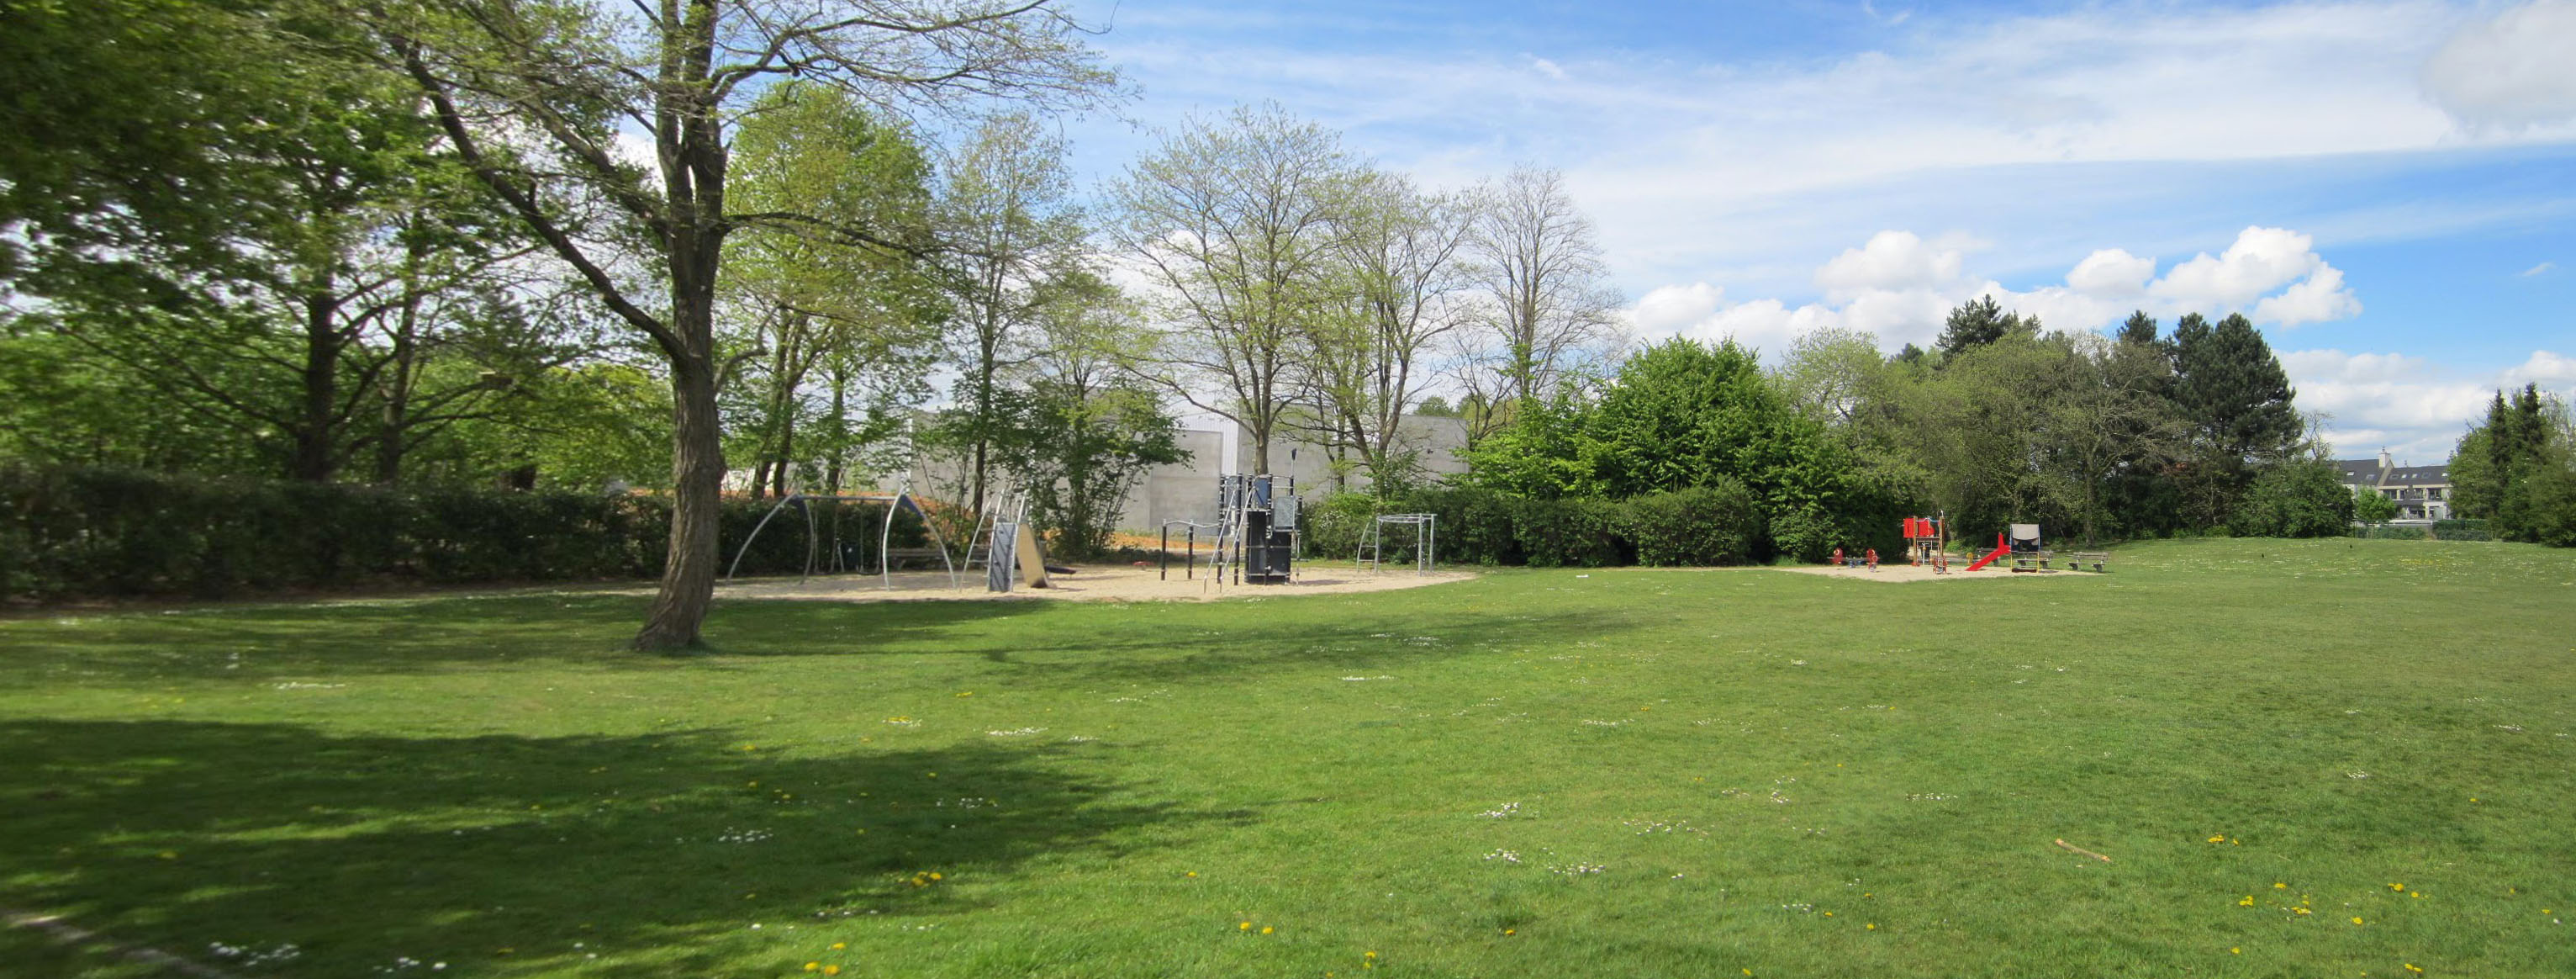 zonnebloempark zone bibliotheek (002).jpg